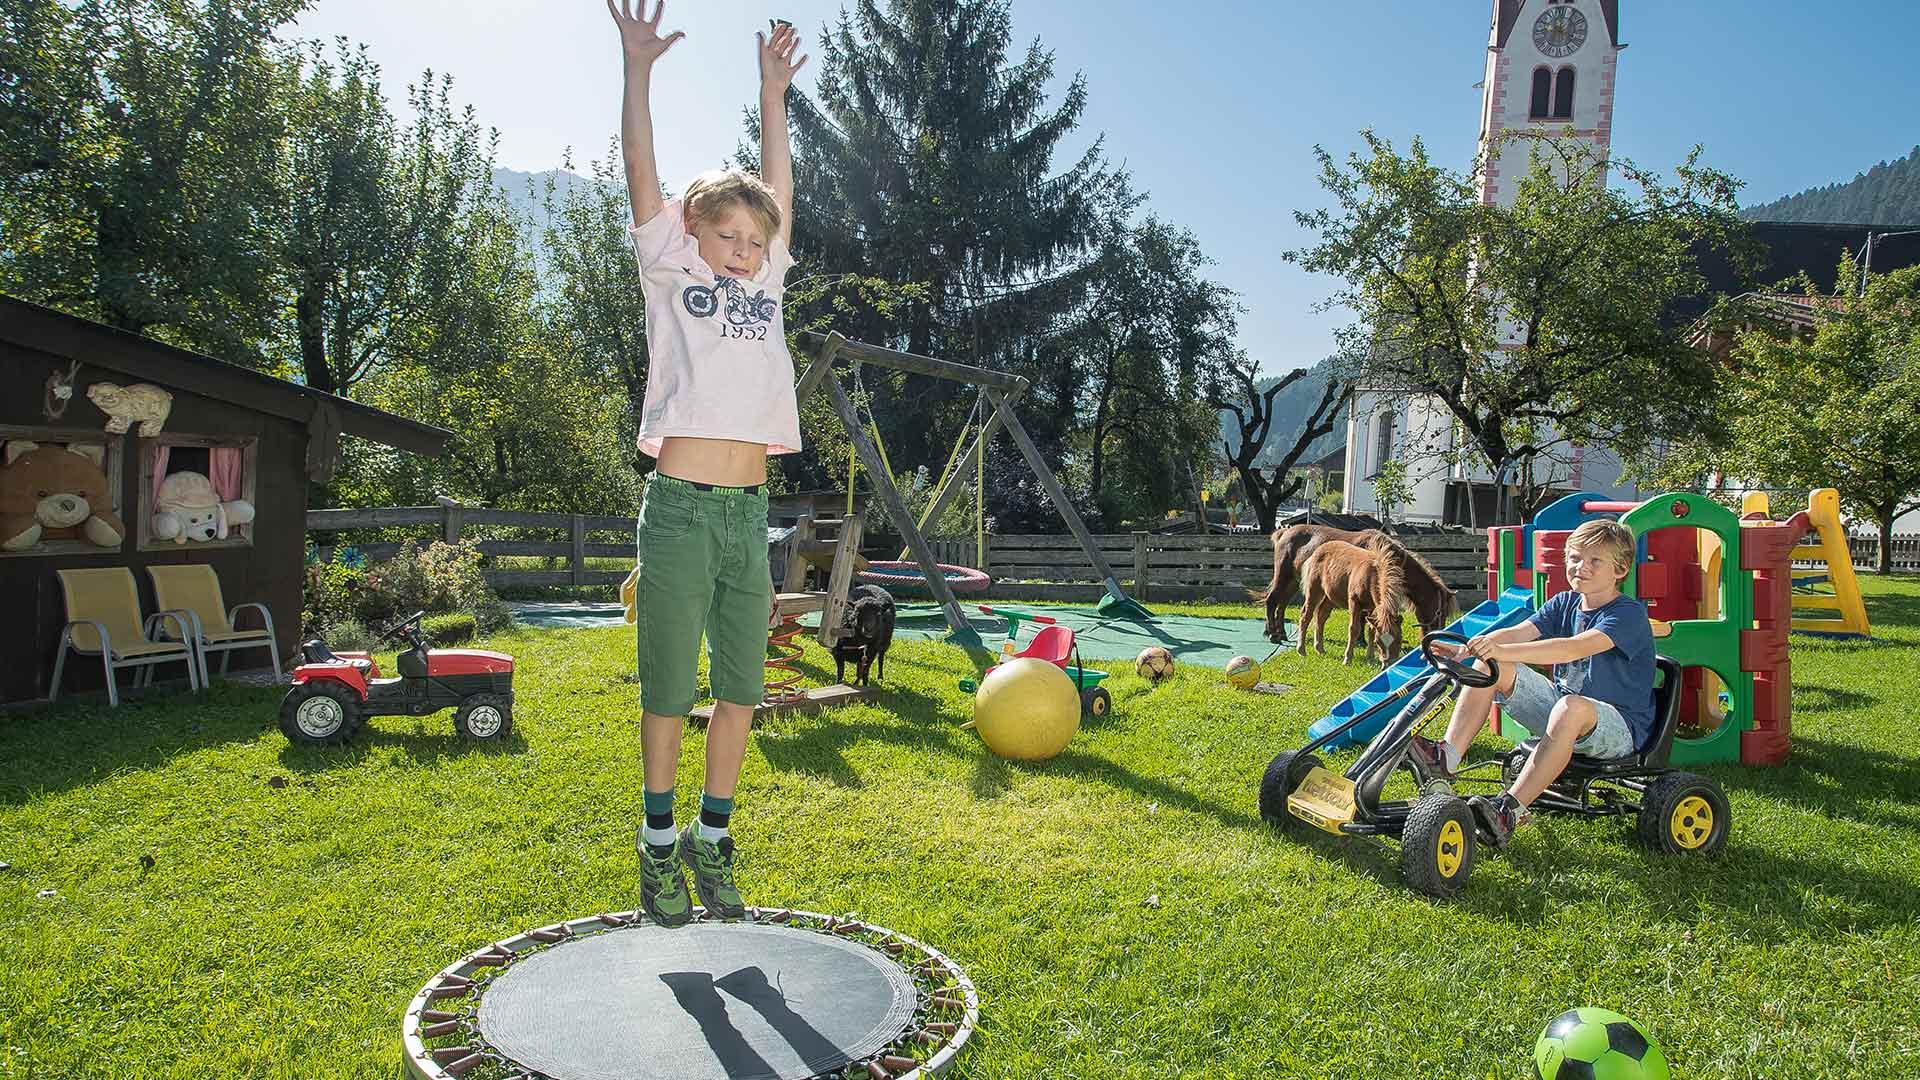 brixnerhof im zillertal: kind & kegel